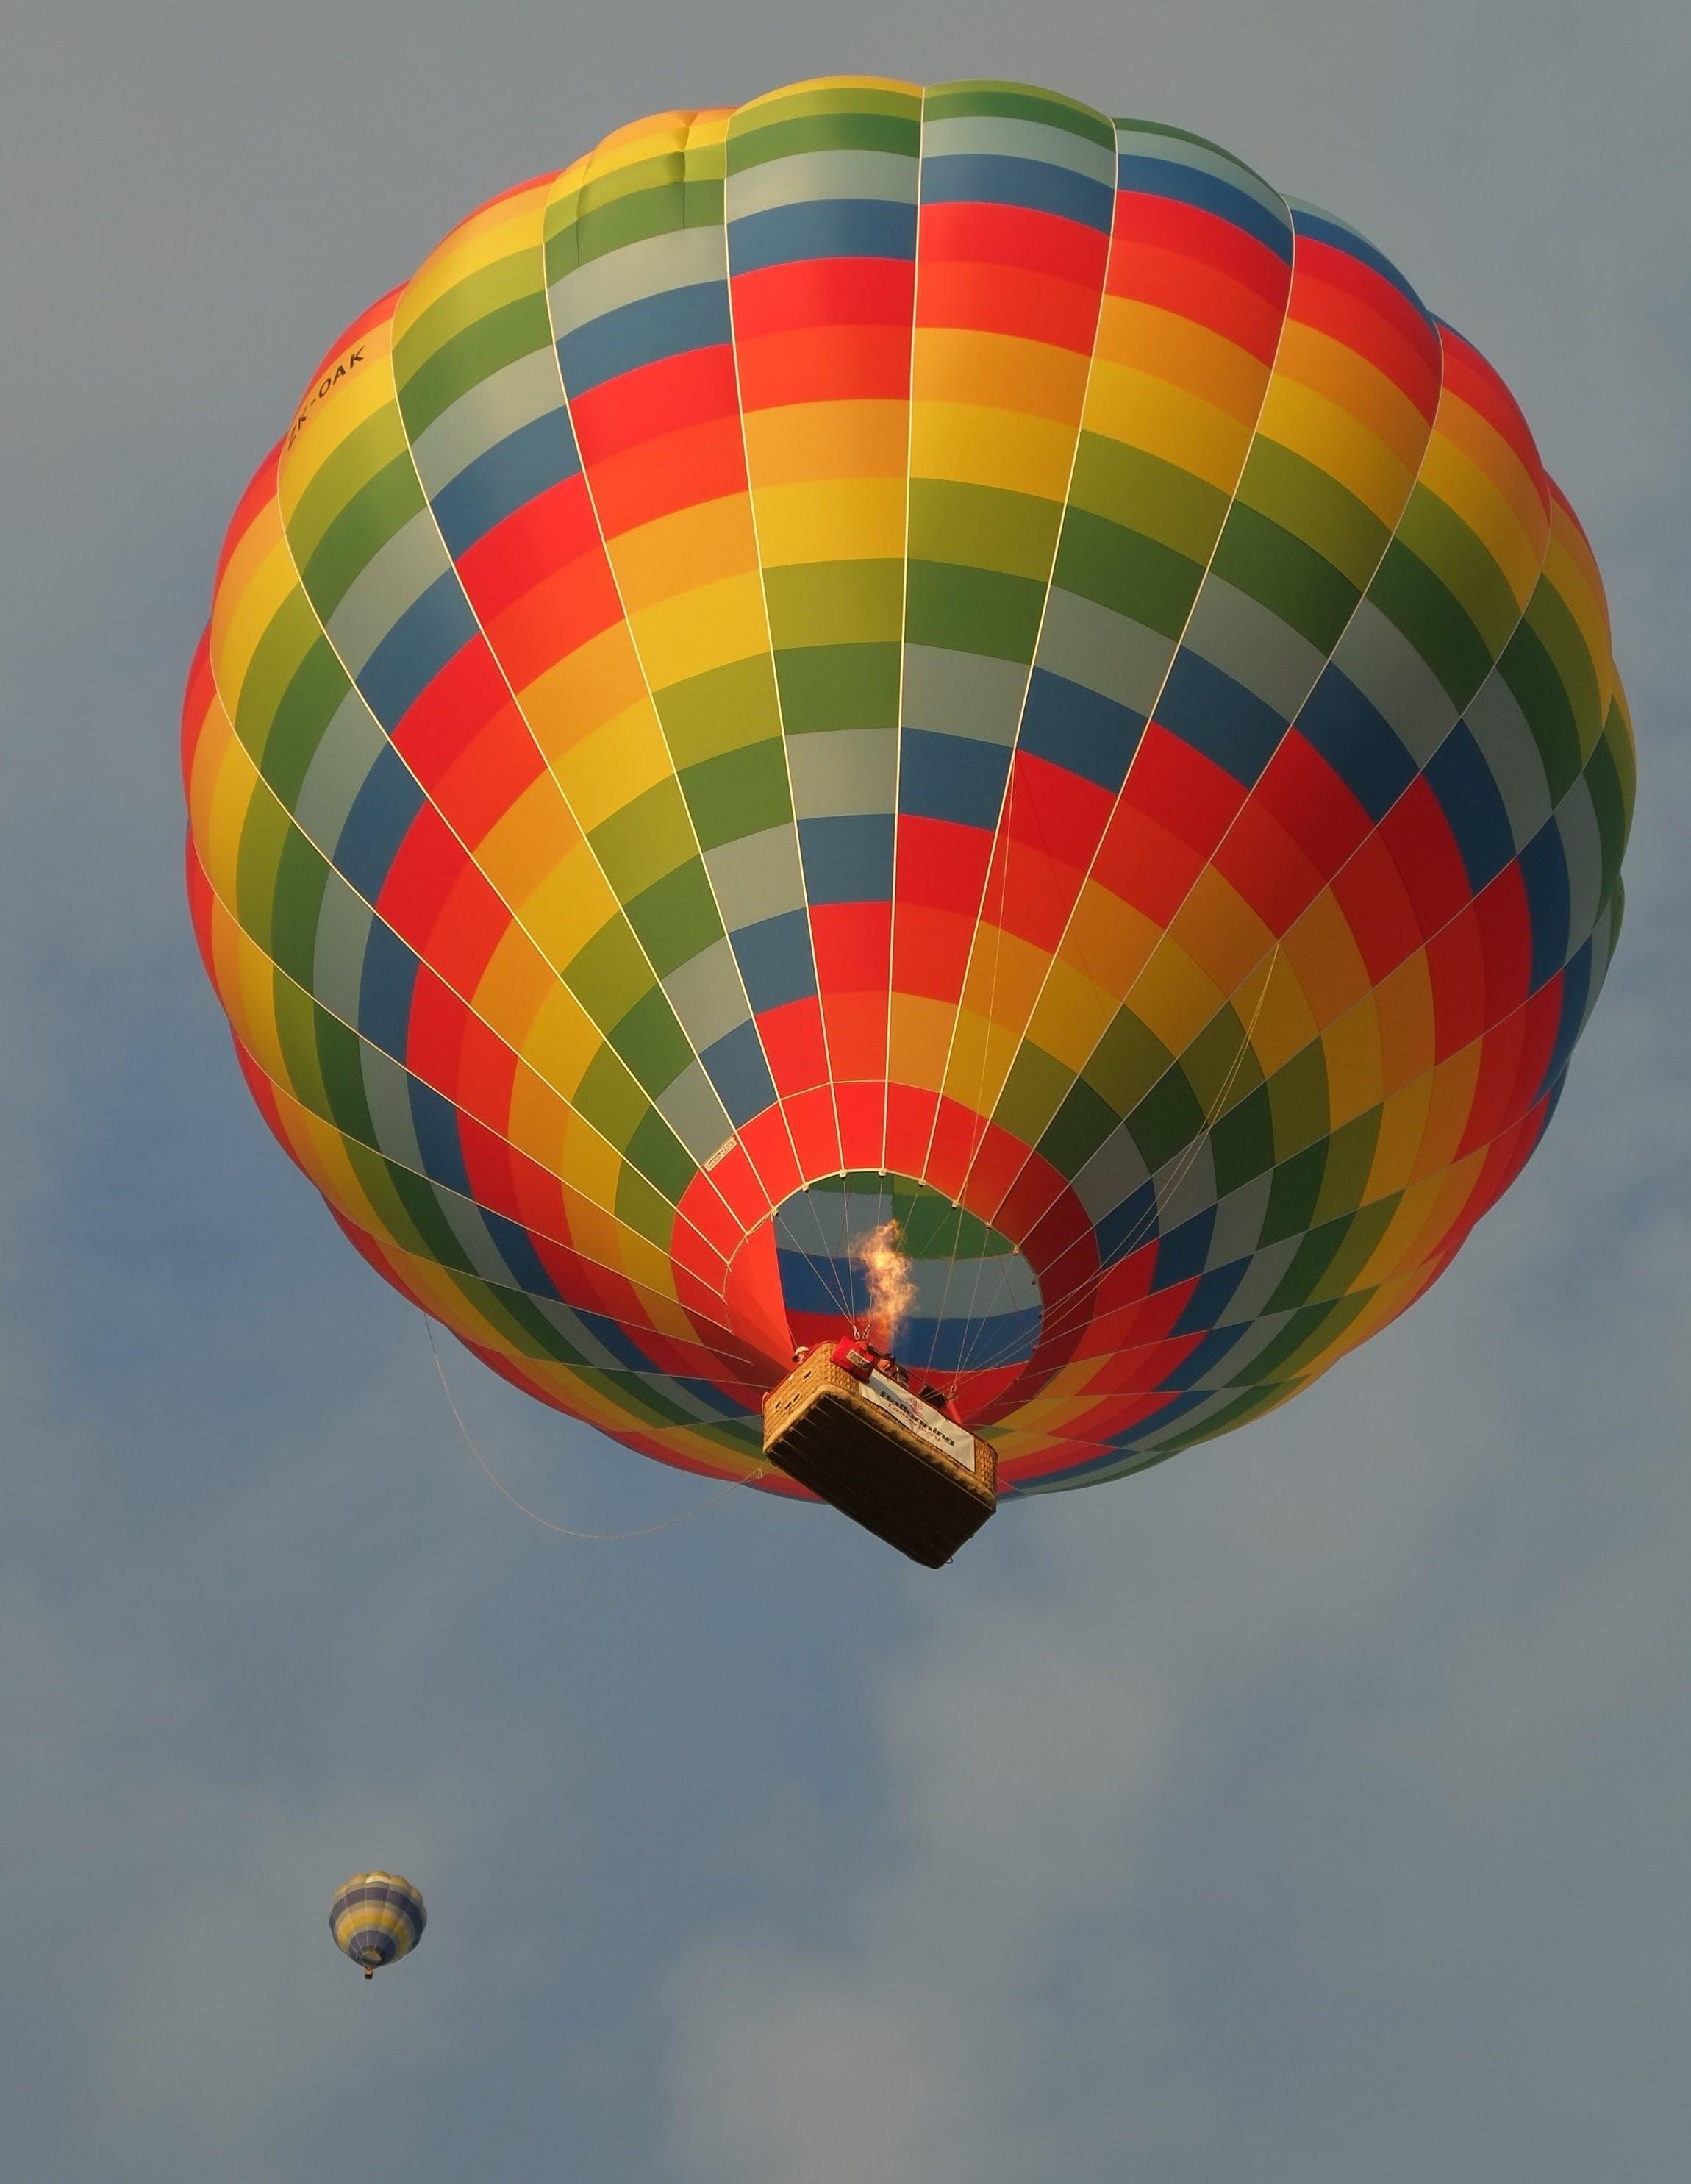 Kostenloses Stock Foto zu himmel, bunt, ballons, heißluftballons